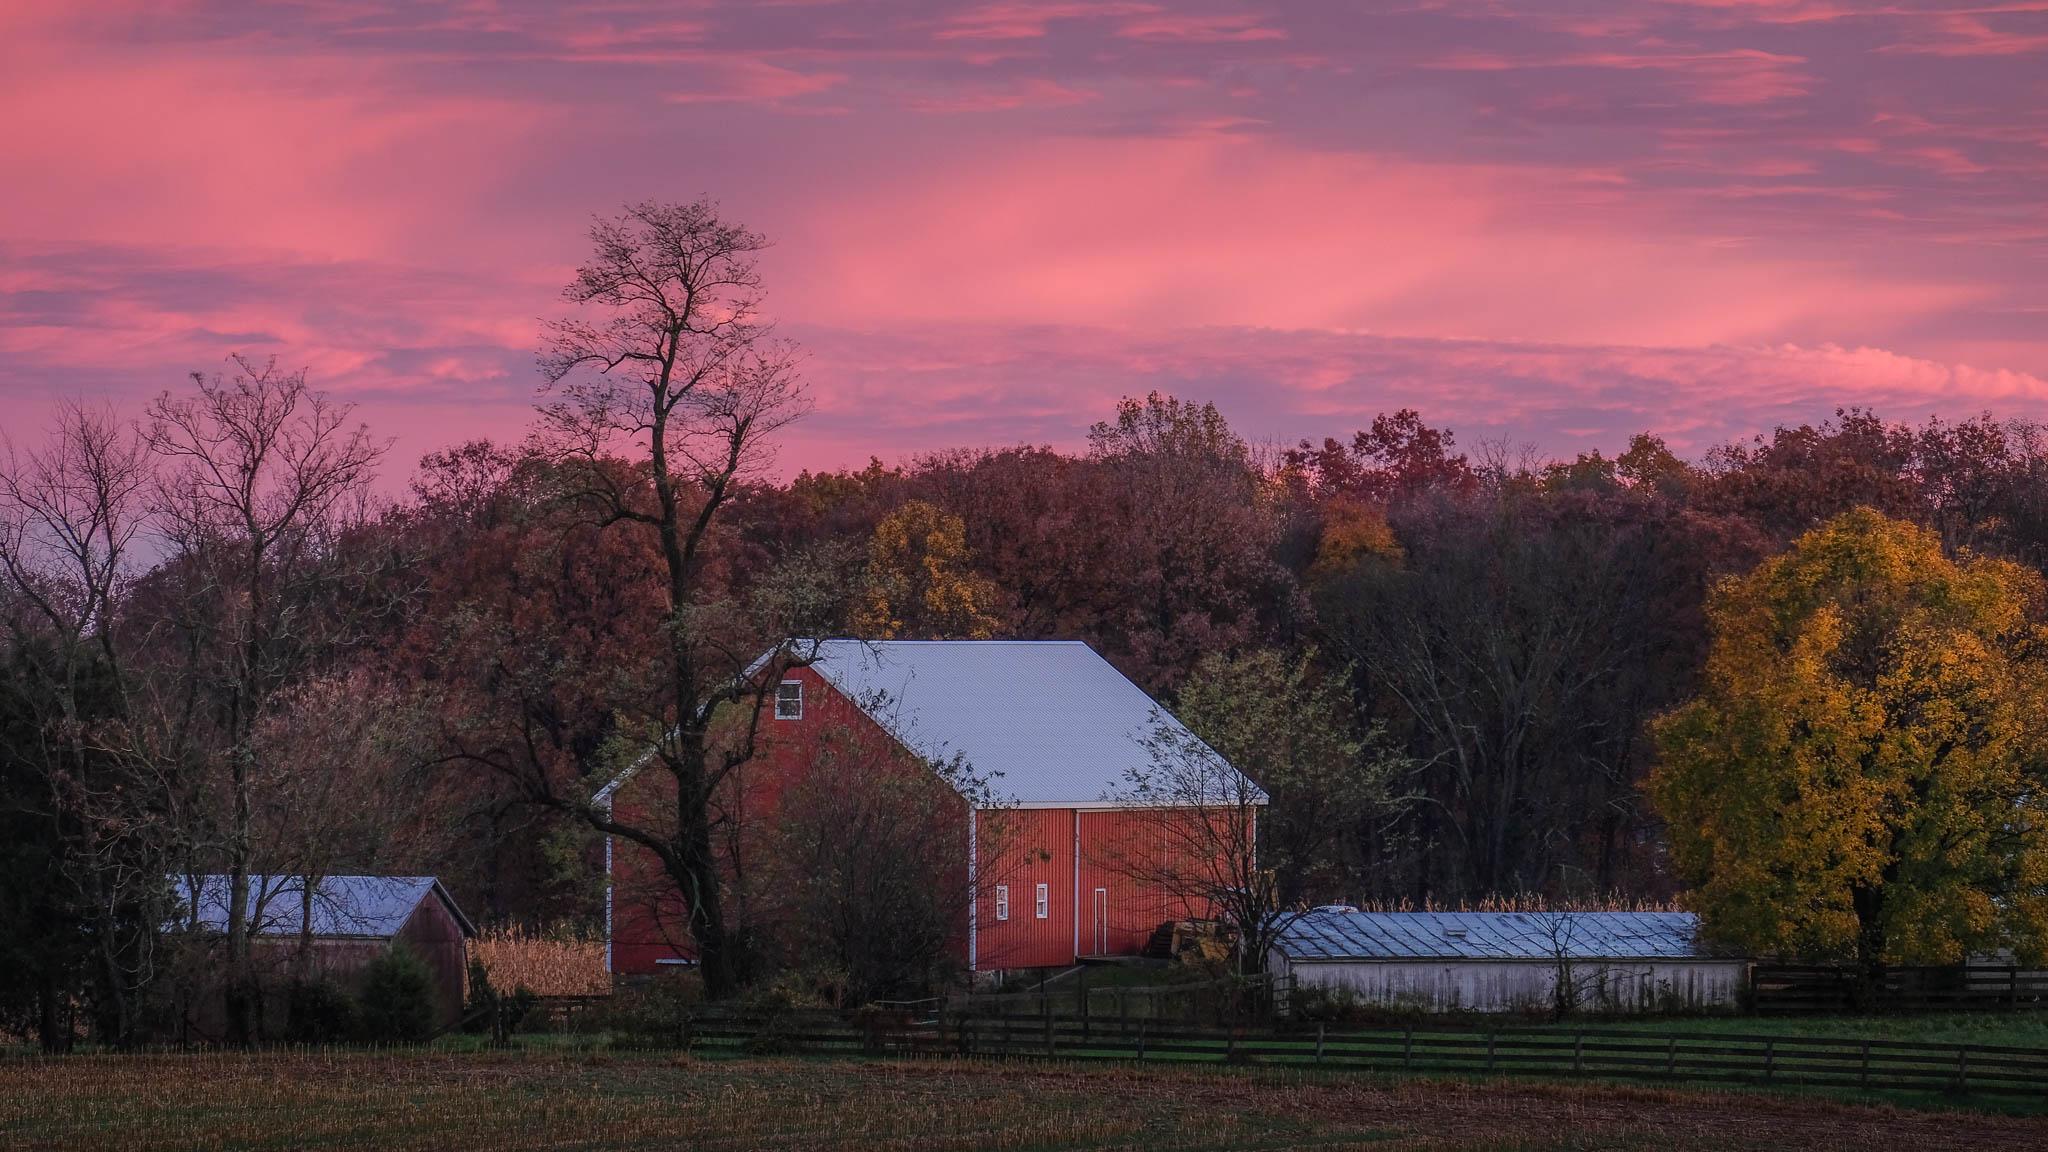 Carroll County, Maryland